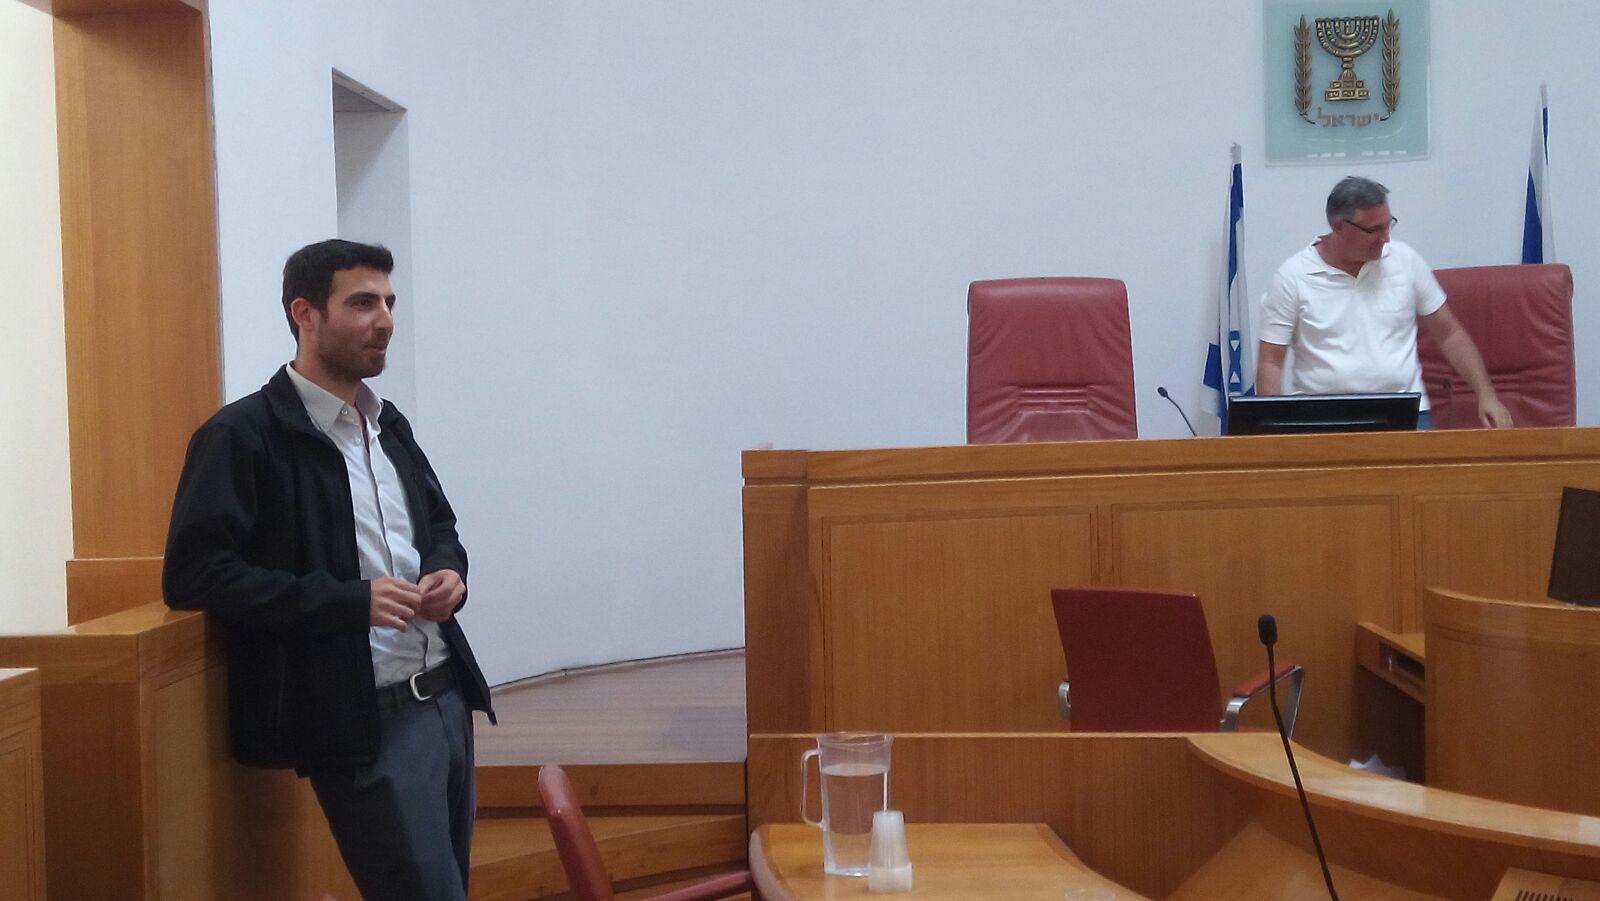 Israel Supreme Court Chameleon Associates